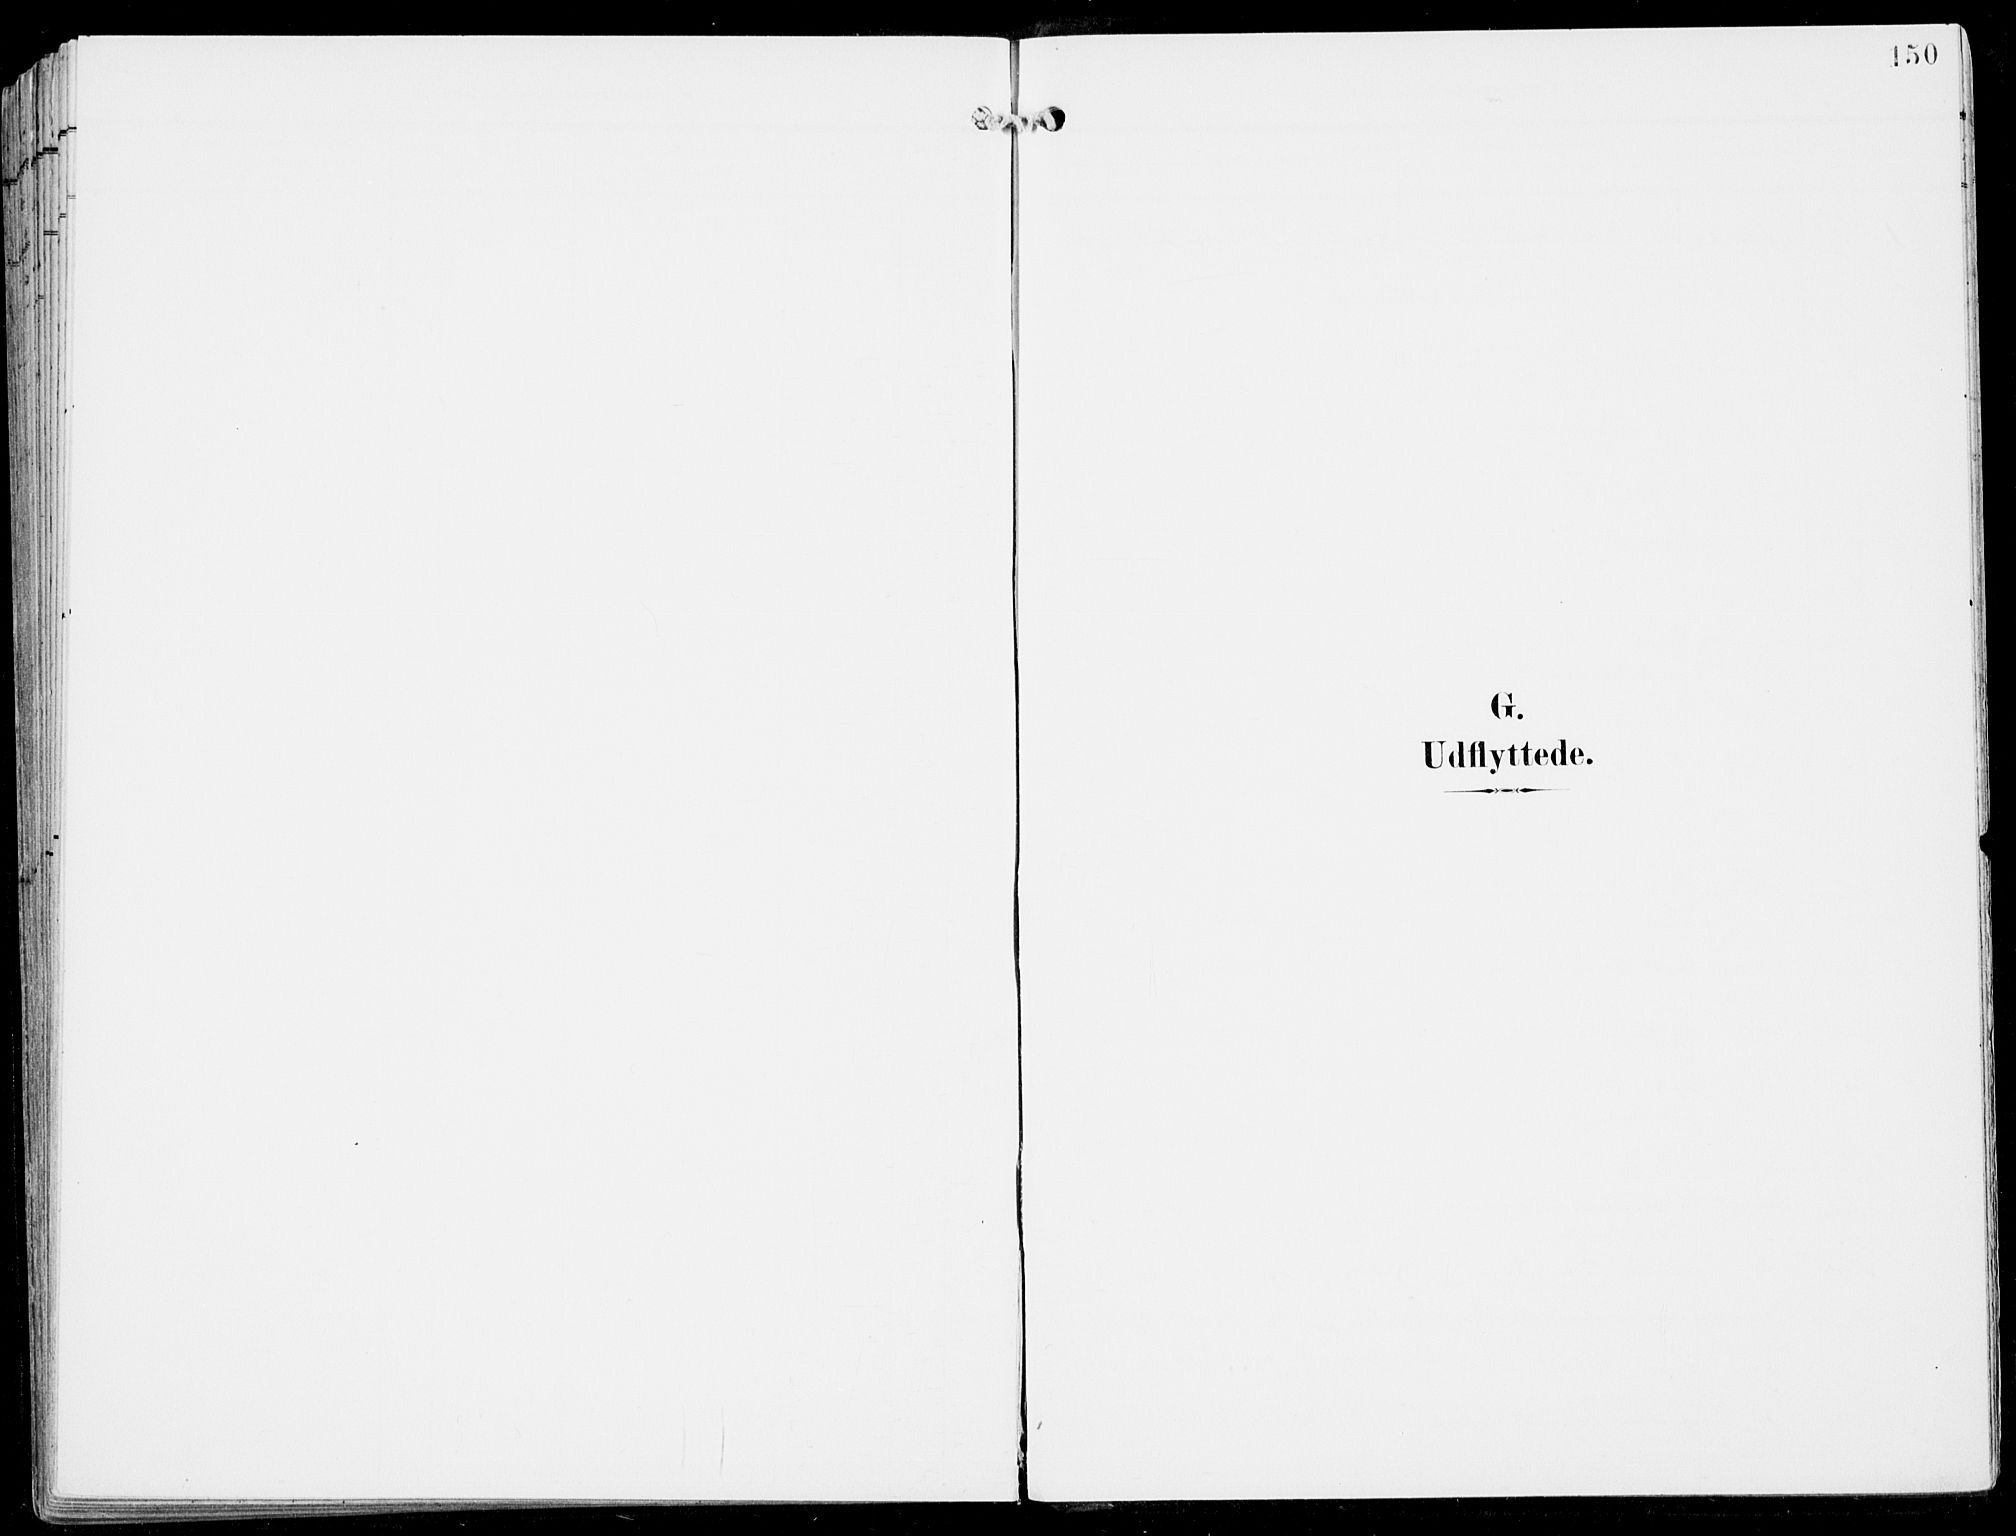 SAB, Ulvik sokneprestembete, H/Haa: Ministerialbok nr. B  2, 1898-1924, s. 150